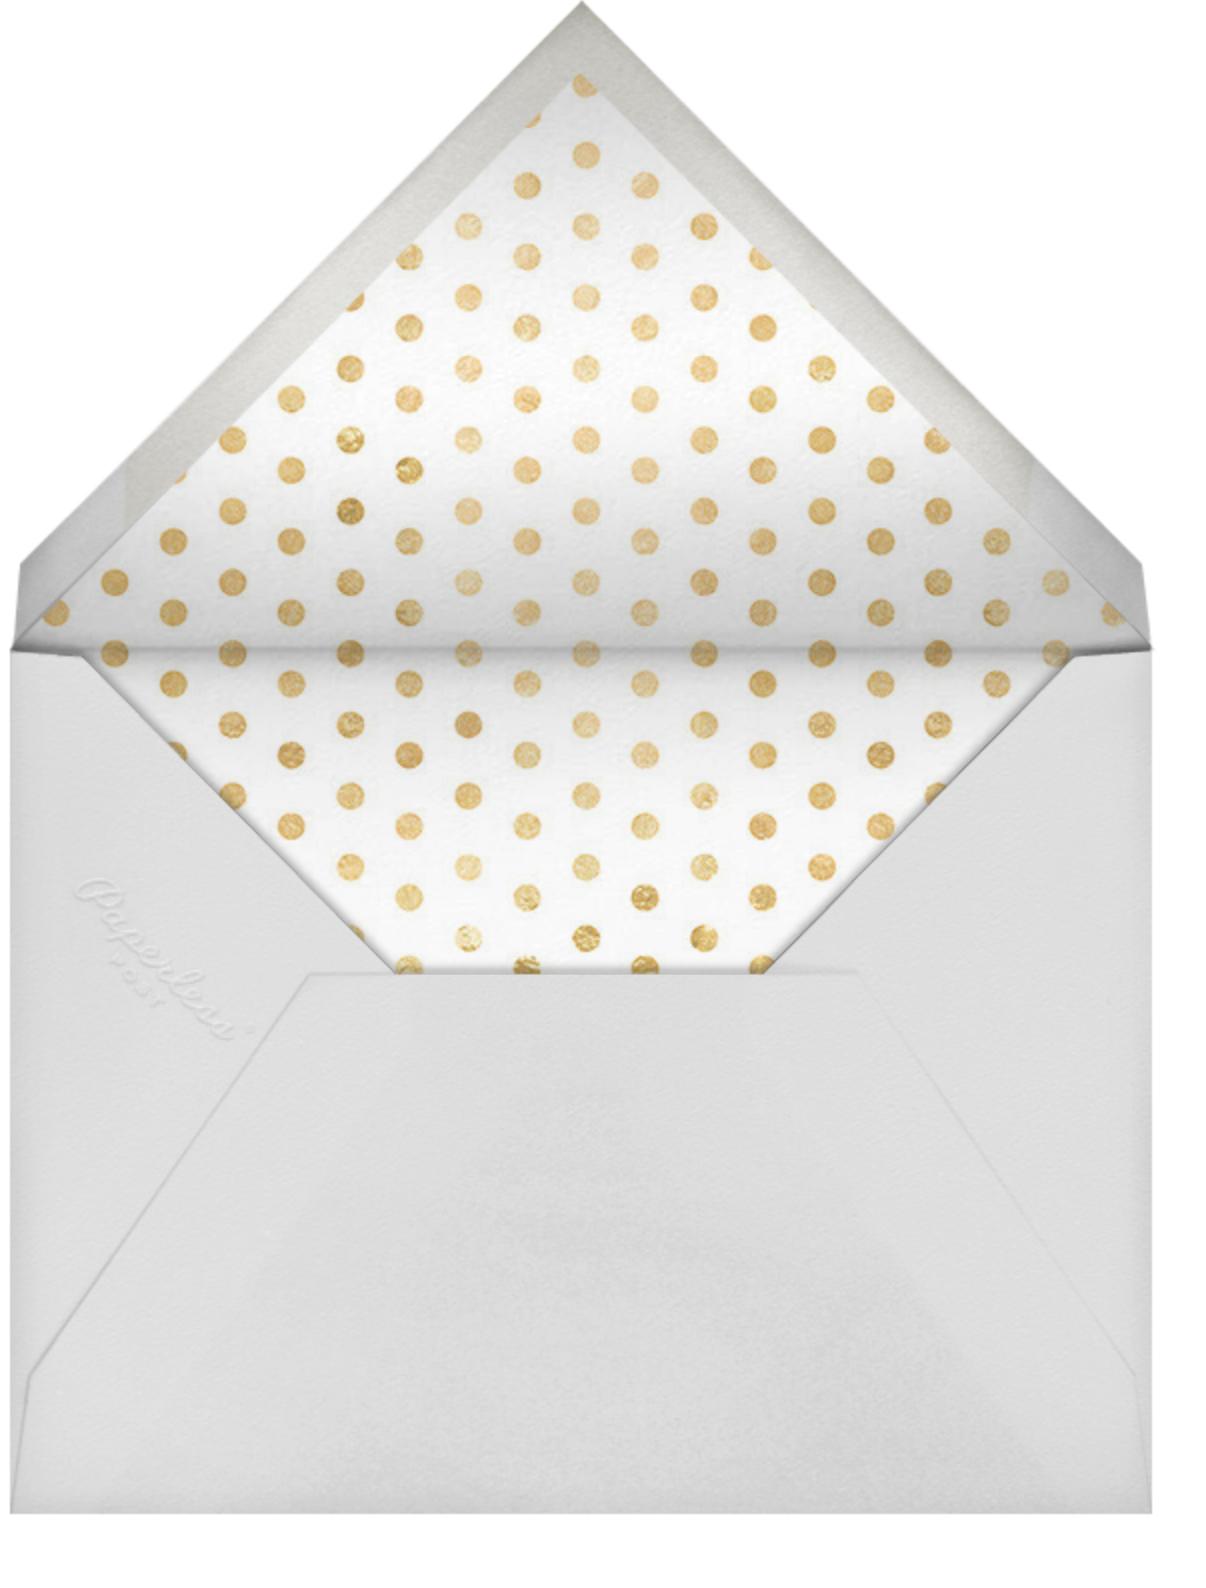 Daisy Place Birthday - Blue - kate spade new york - First birthday - envelope back